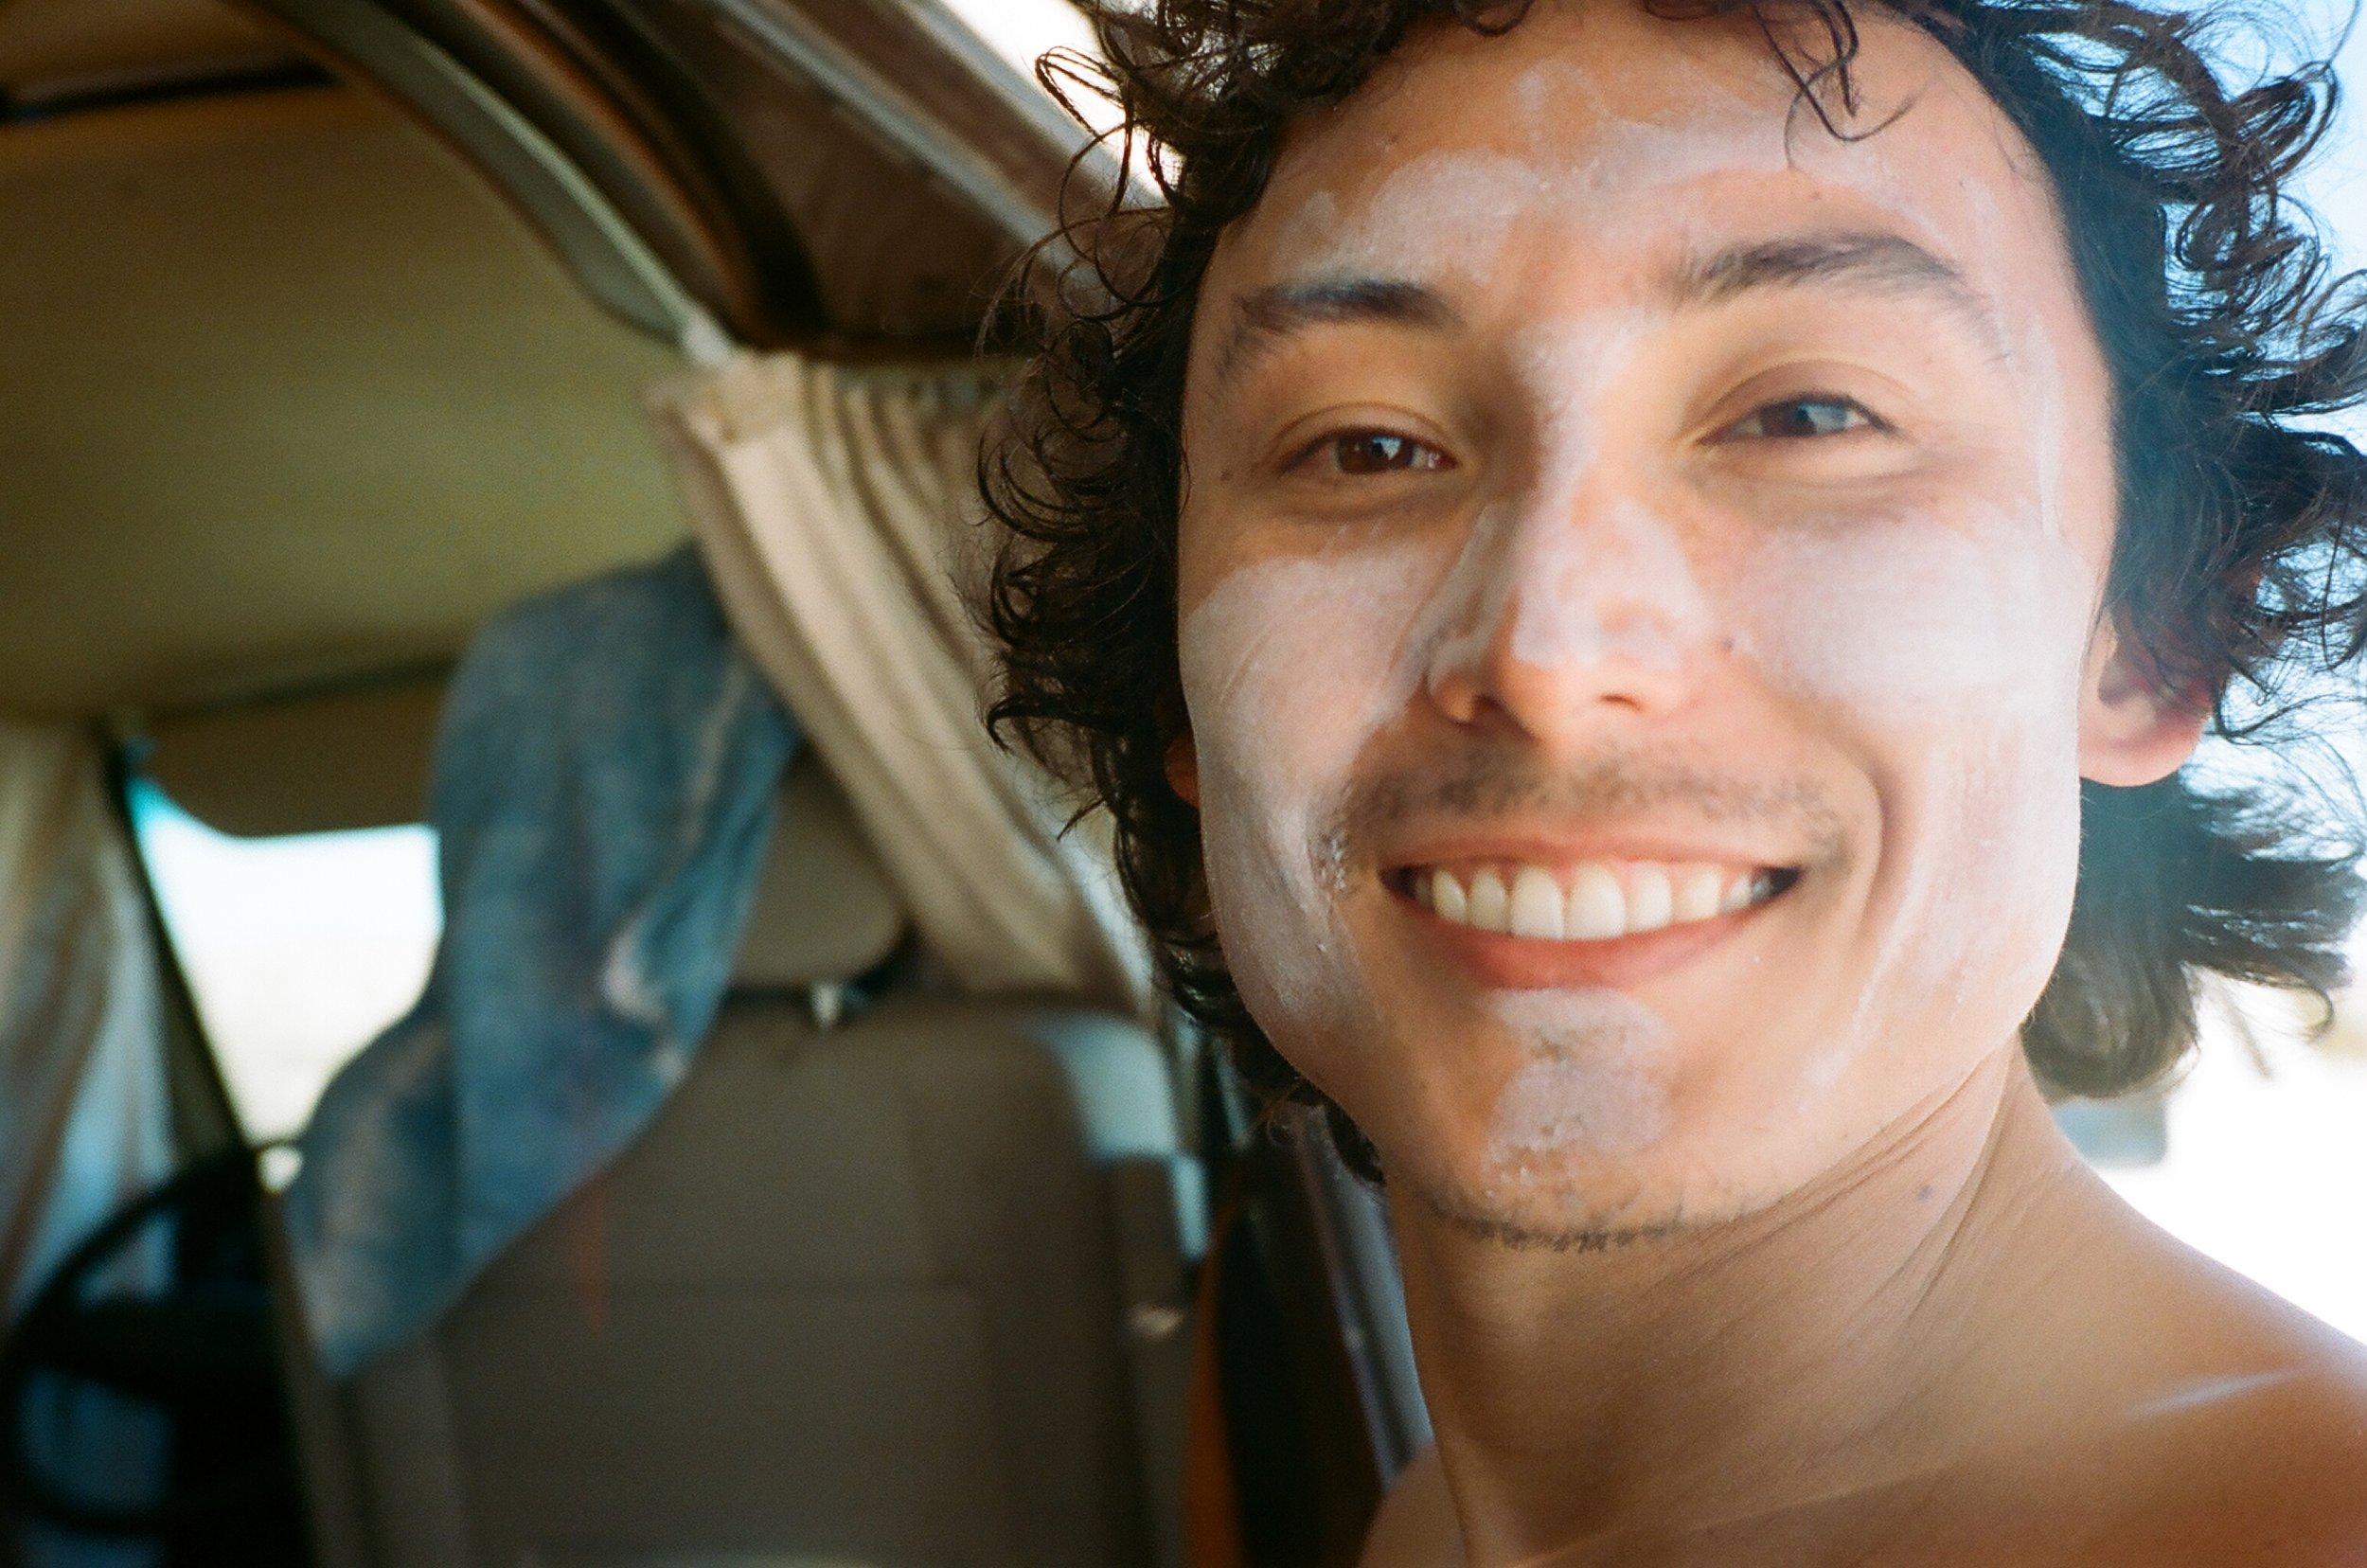 Owen in his sunscreen